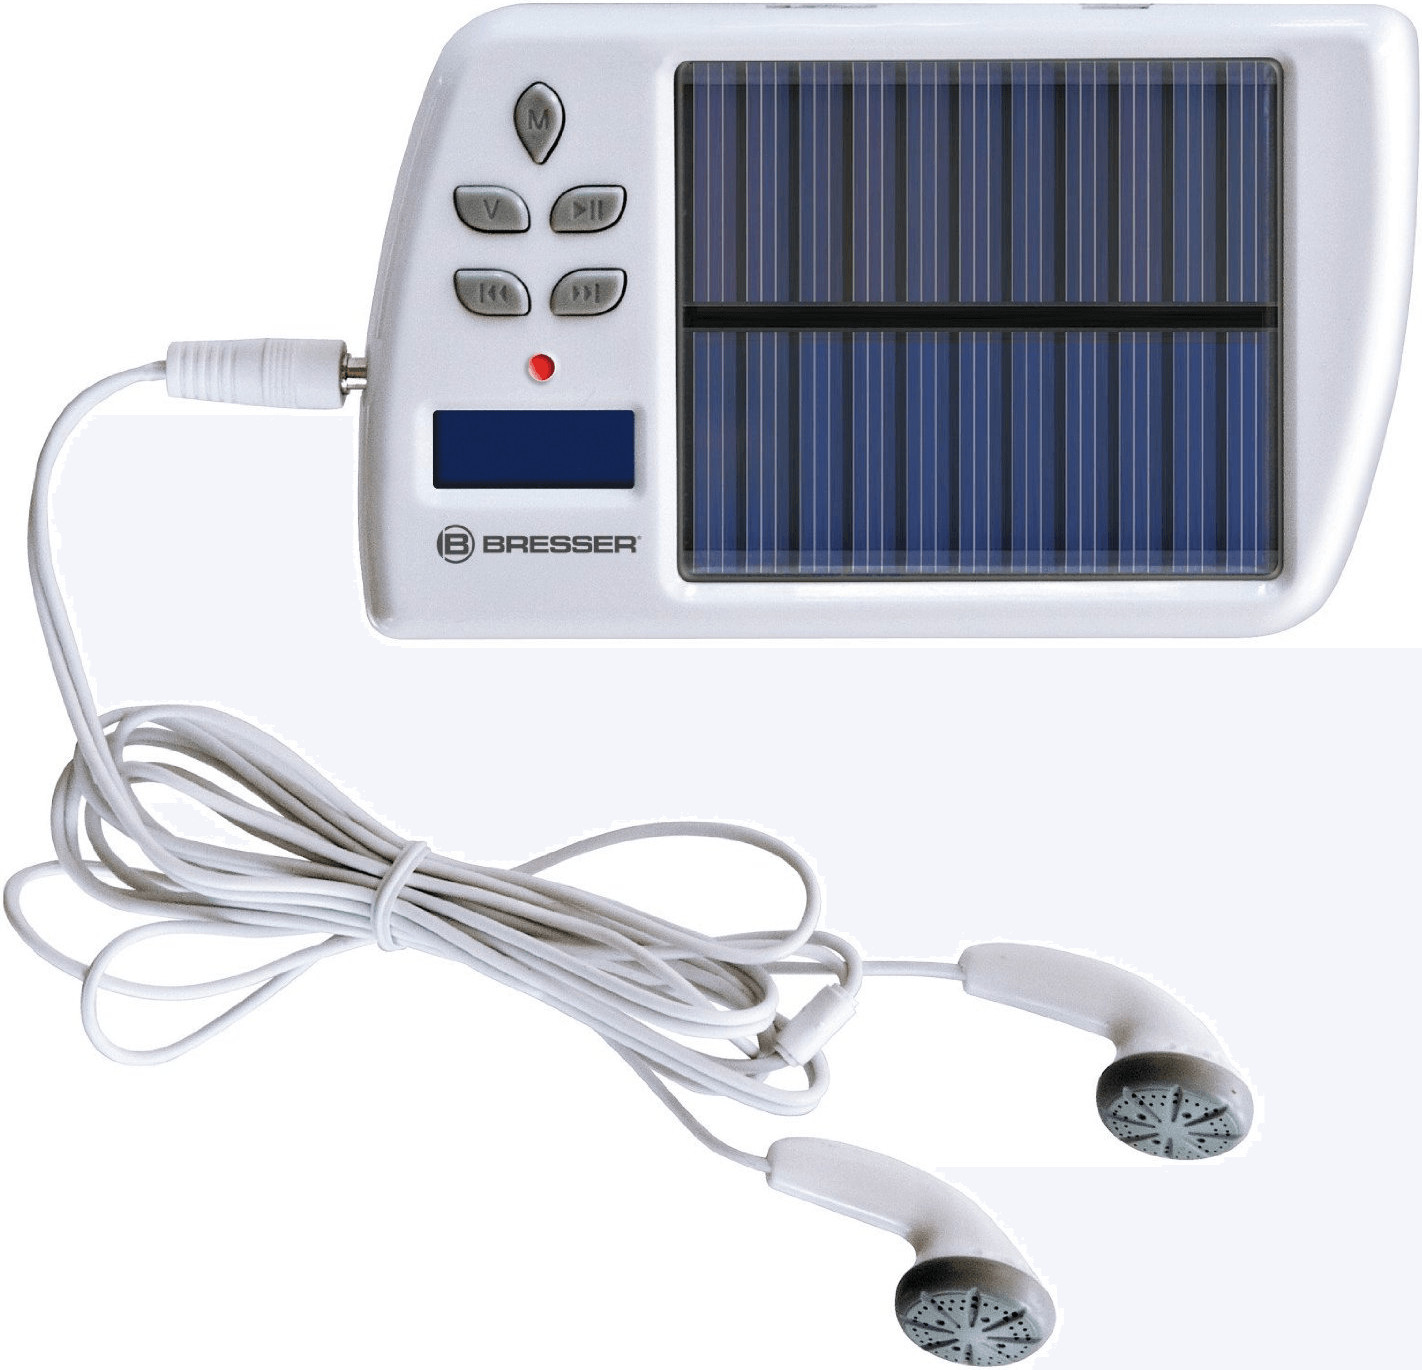 Bresser MP3 Solar Charger FM